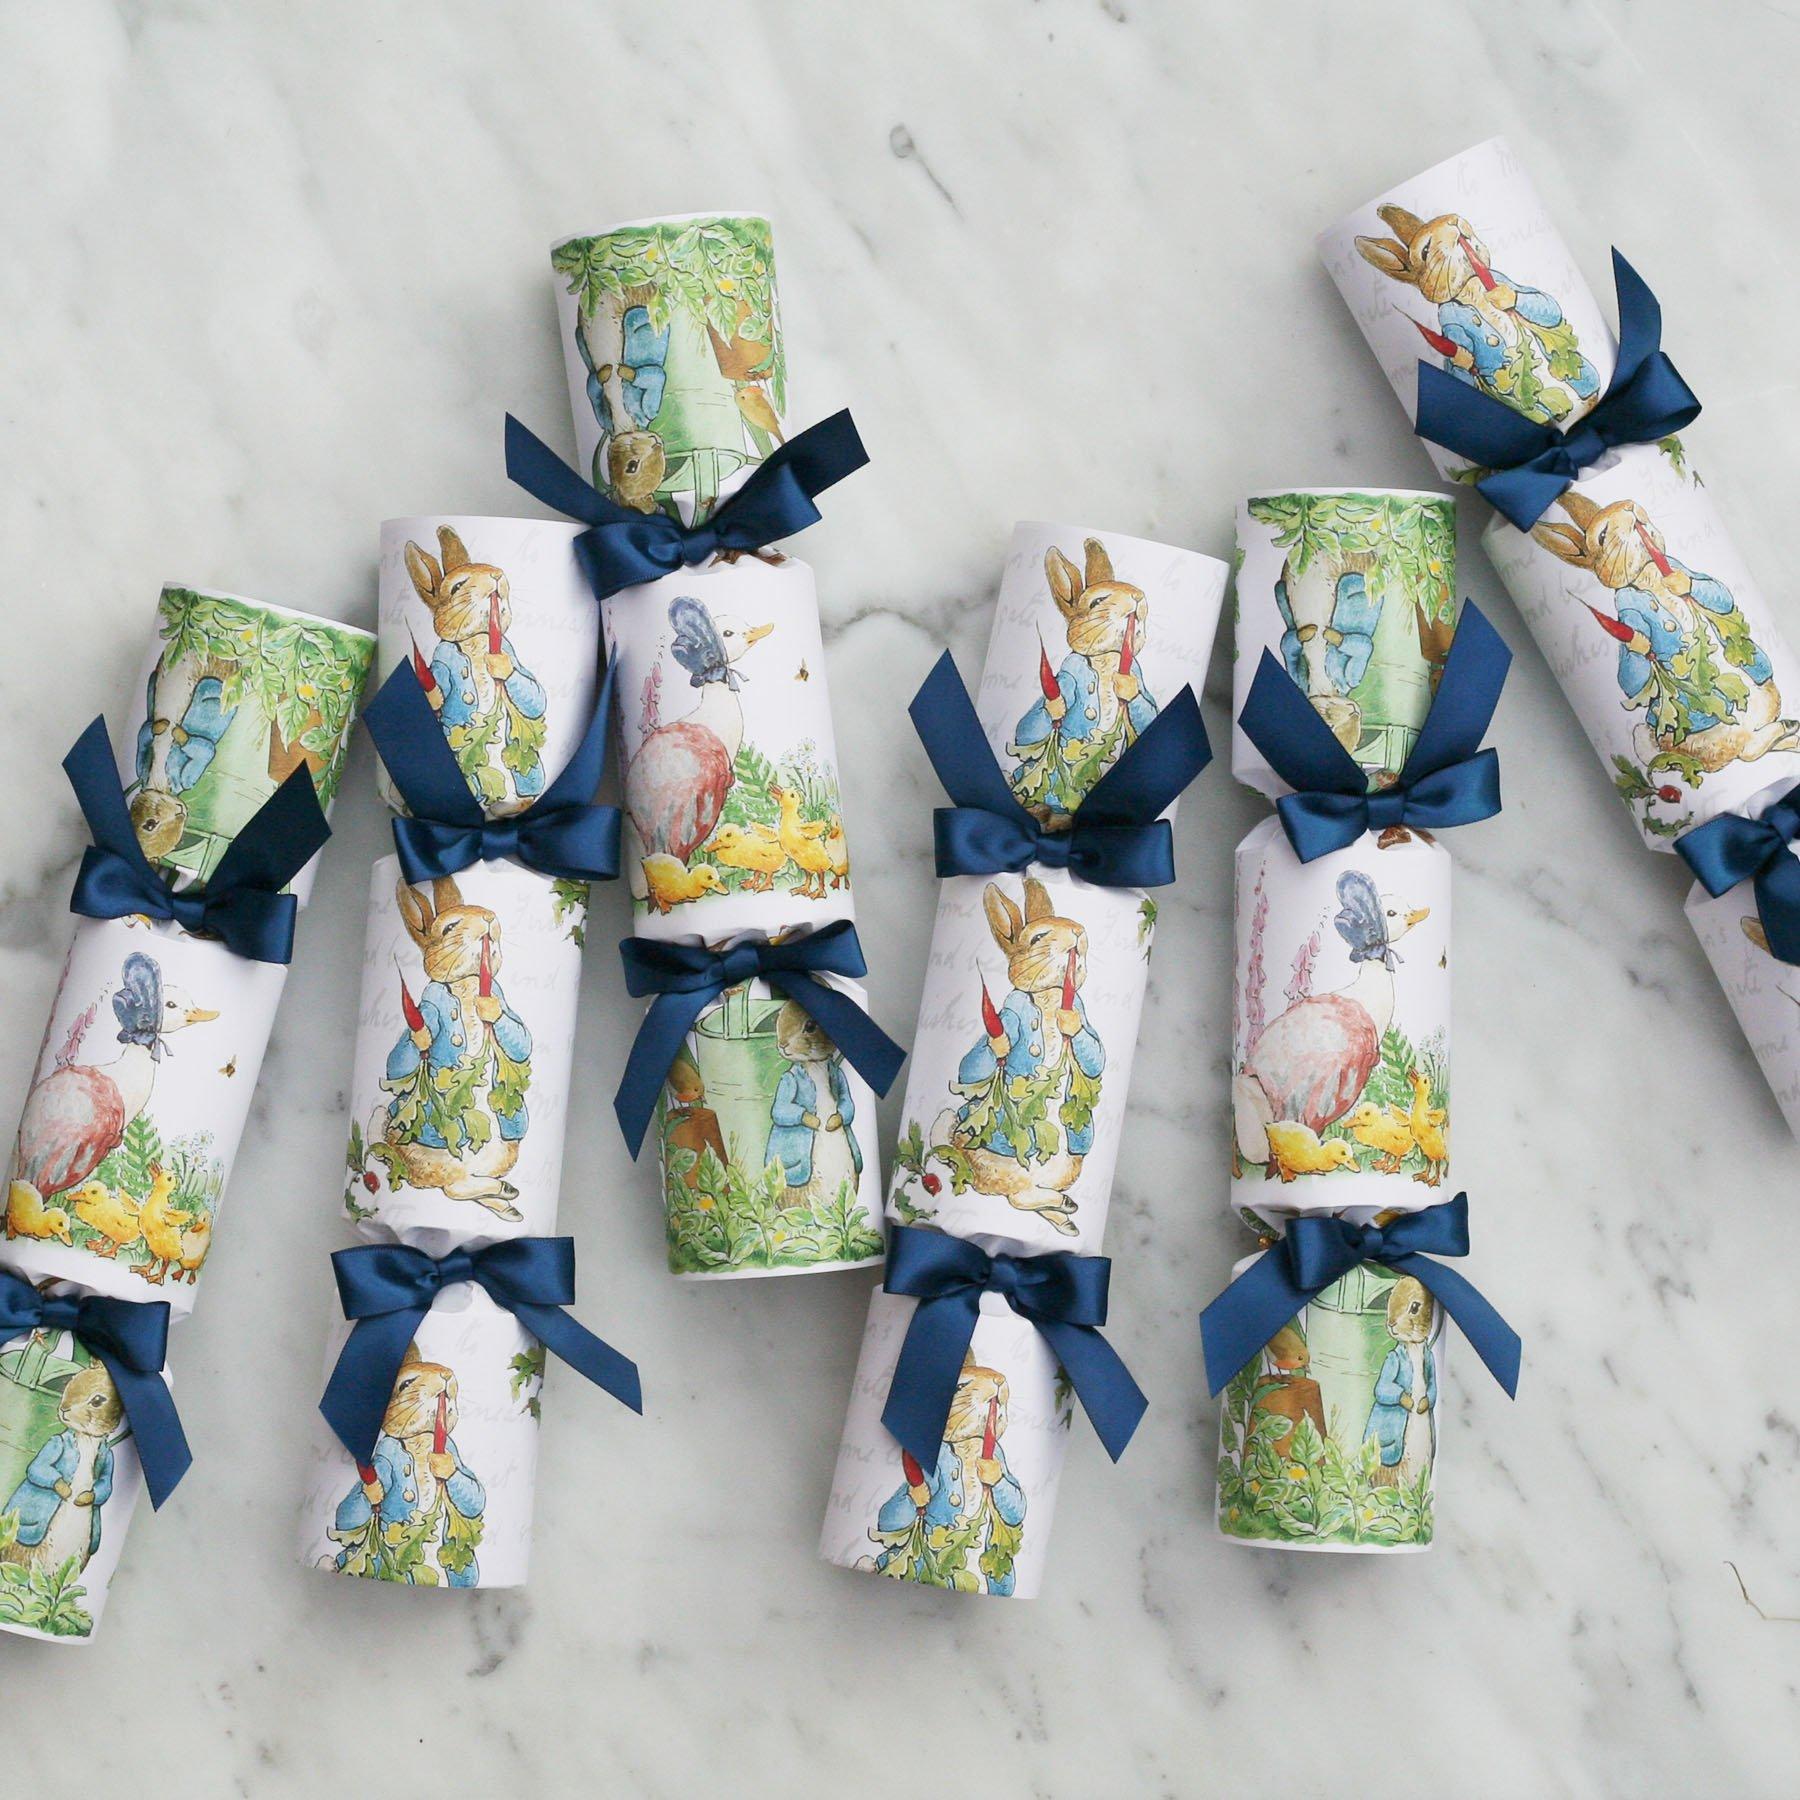 Party Cracker Peter Rabbit Selection Gustavia